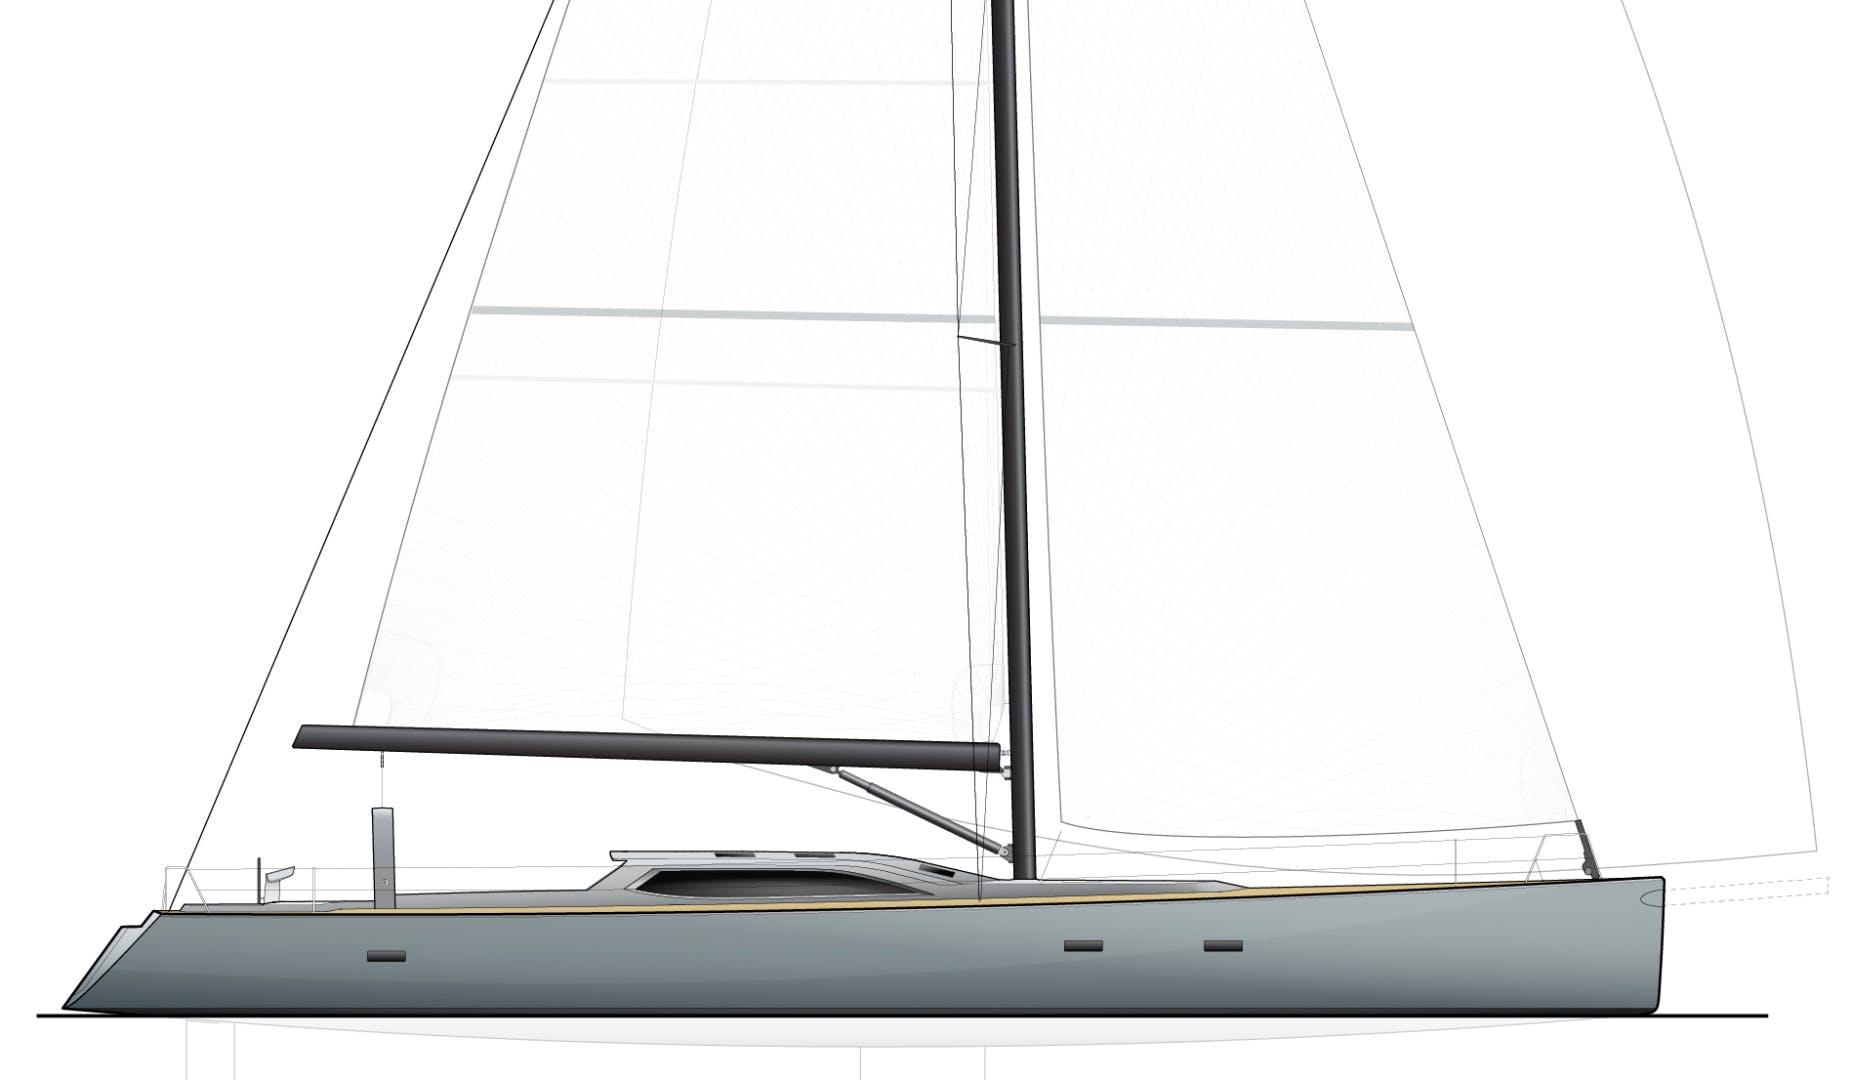 1996 Goetz / Derecktor 77' Custom Sparkman & Stephens Designed Performance Sailing Yacht AANDEEL | Picture 7 of 24